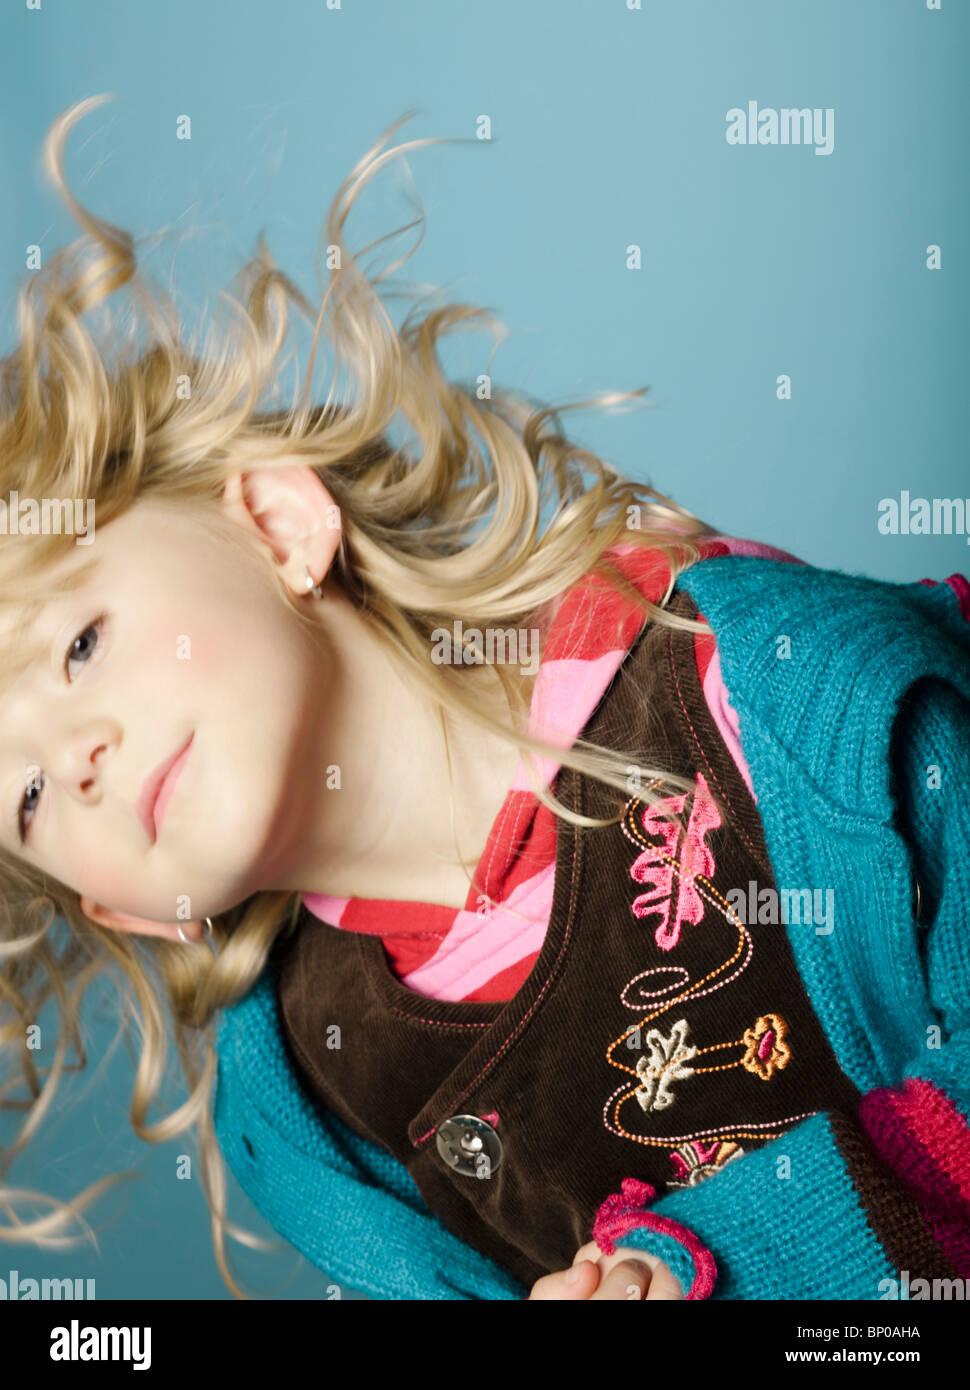 Little girl moving her head - Stock Image